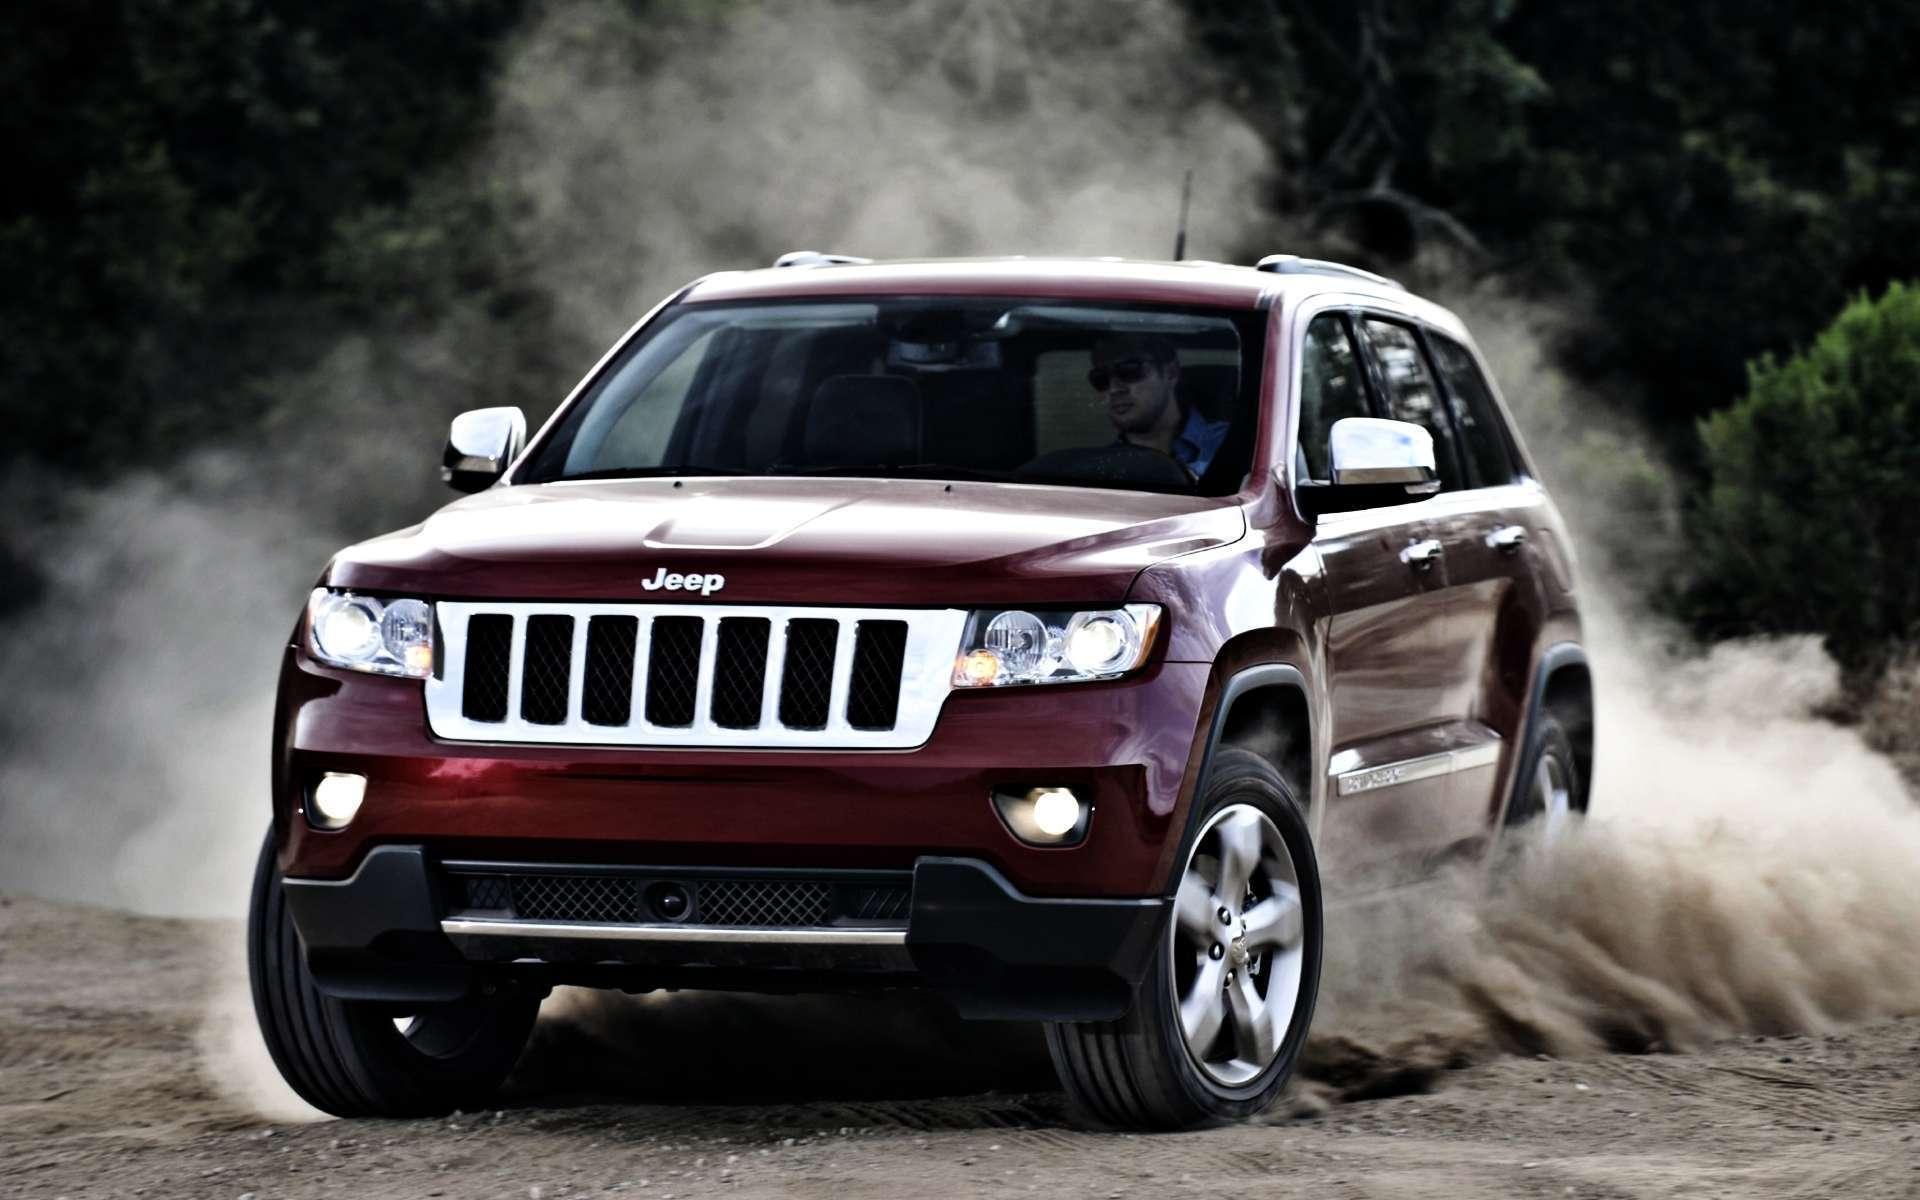 Hd wallpaper jeep - Jeep Grand Cherokee Hd Hd Wallpapers Hd Car Wallpapers